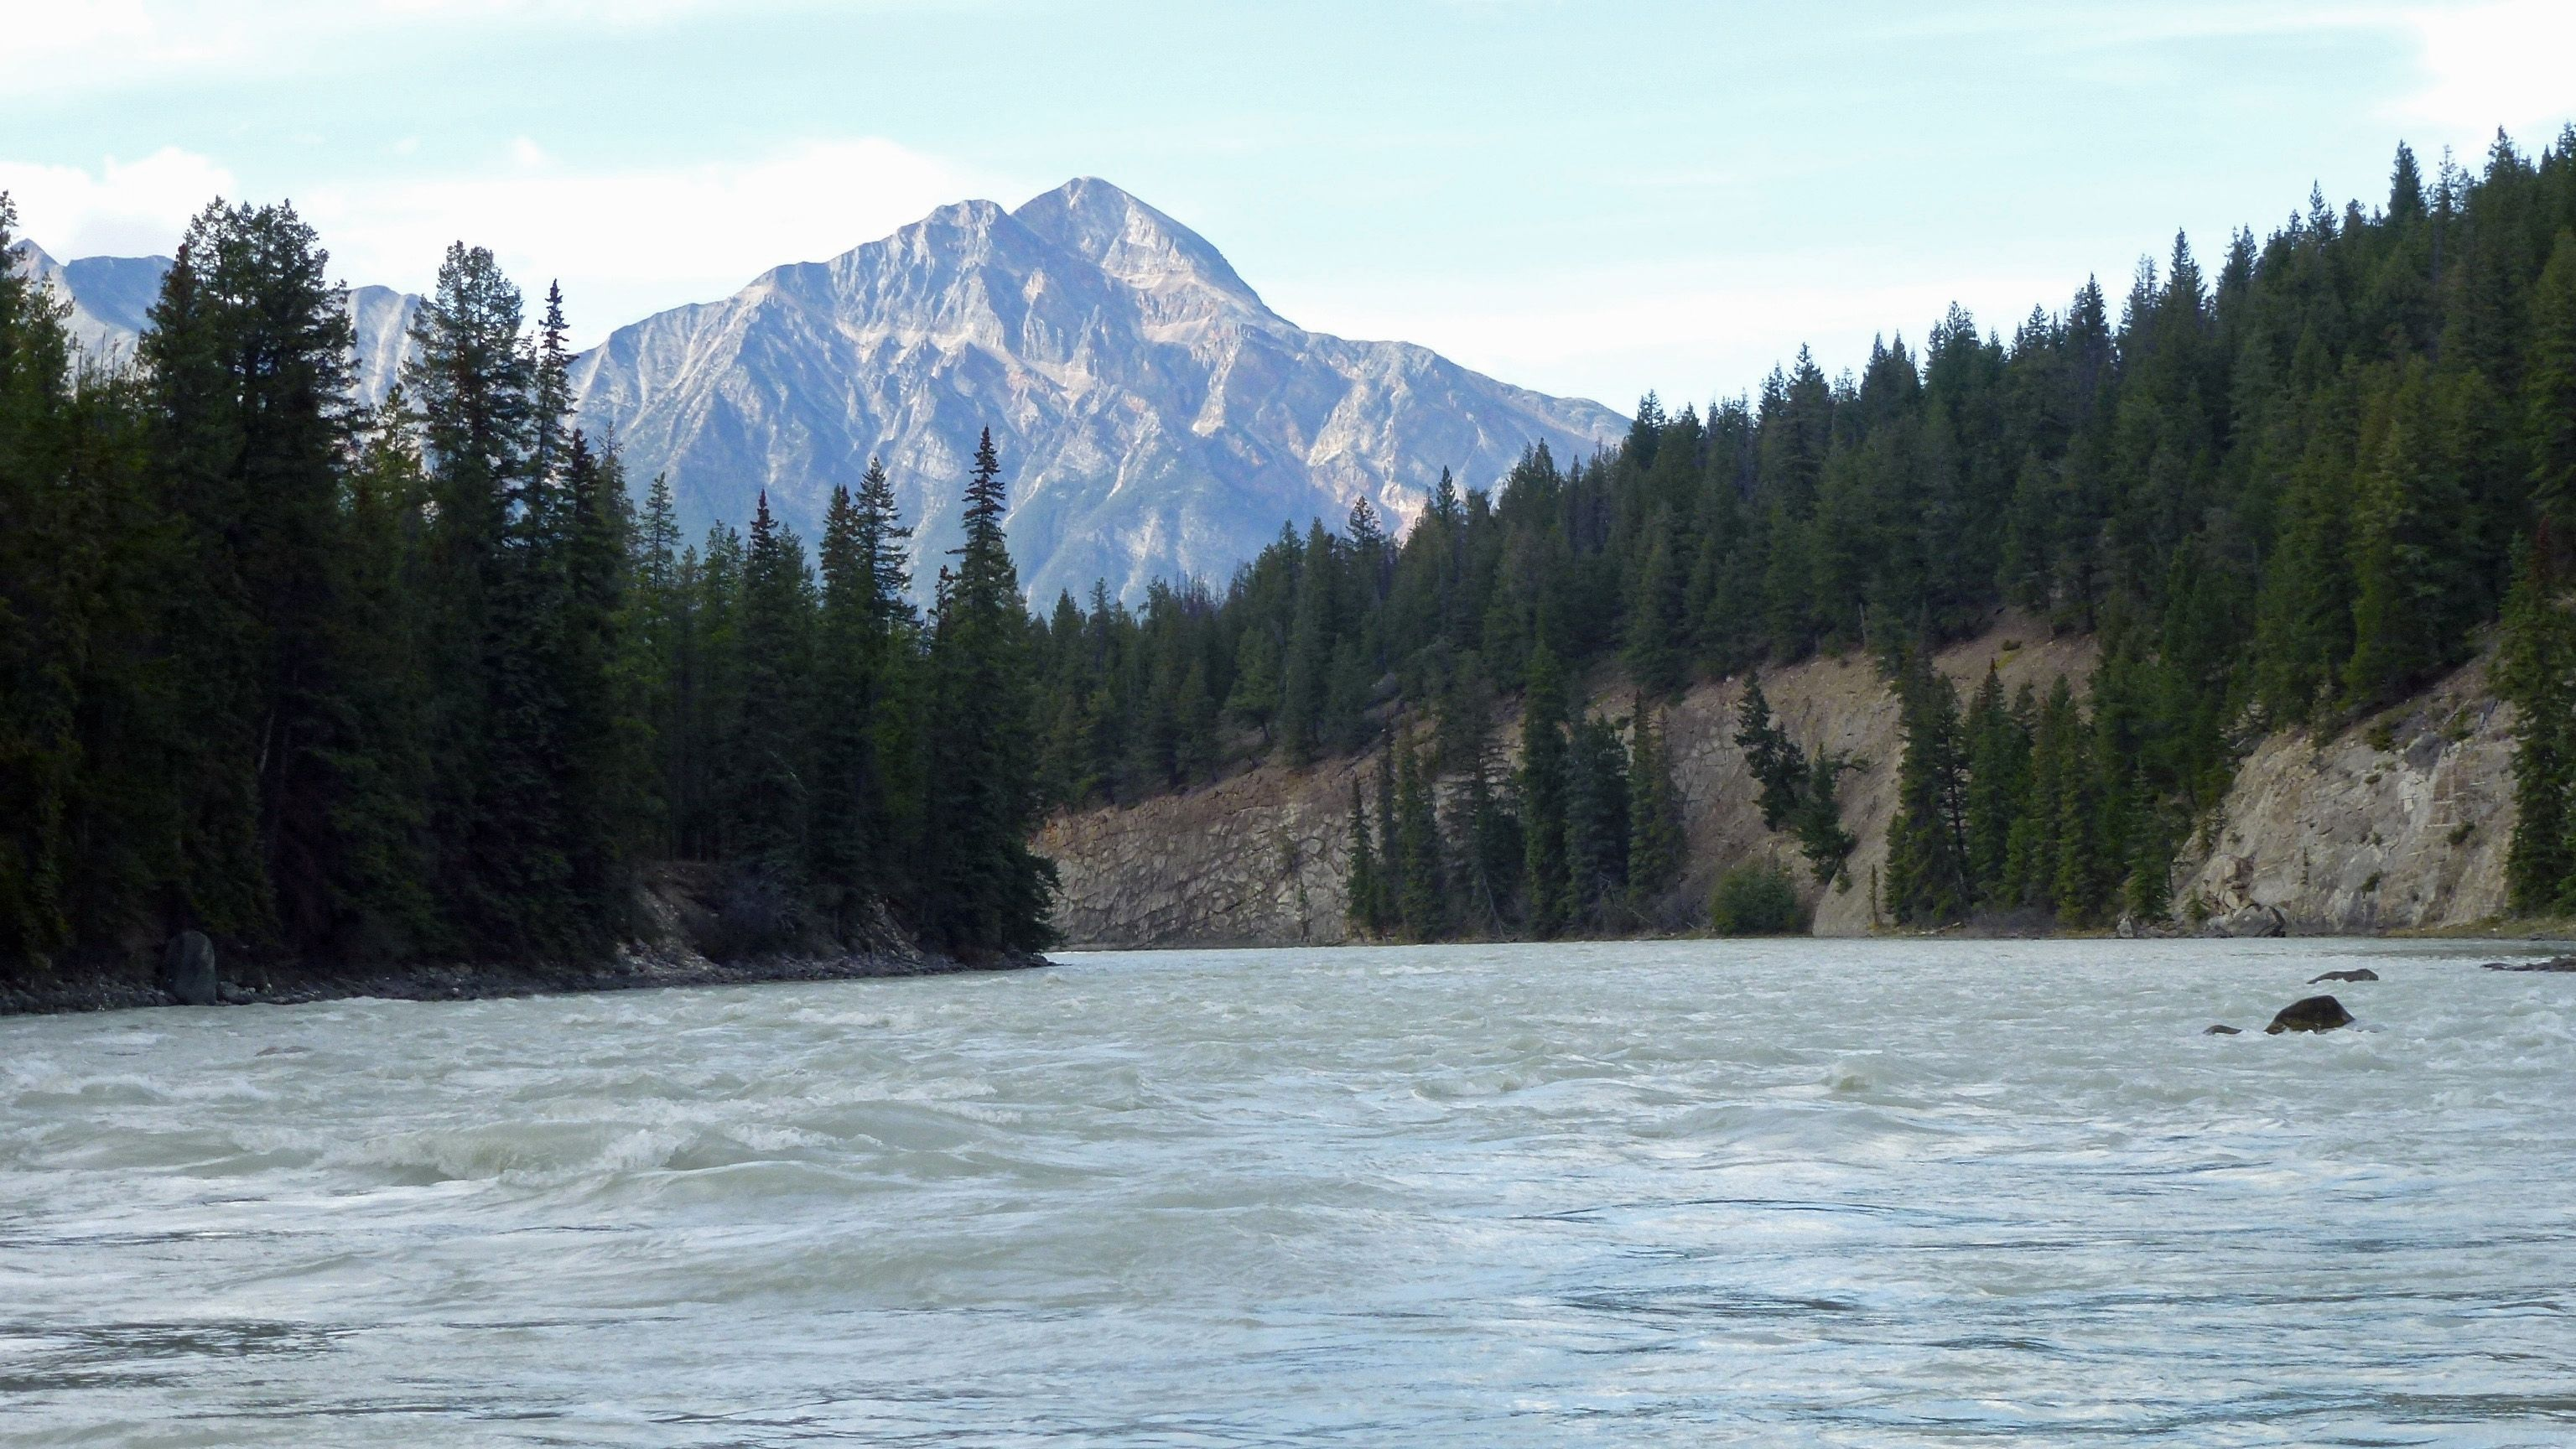 athabasca river rafting jasper national park alberta river rafting national parks athabasca